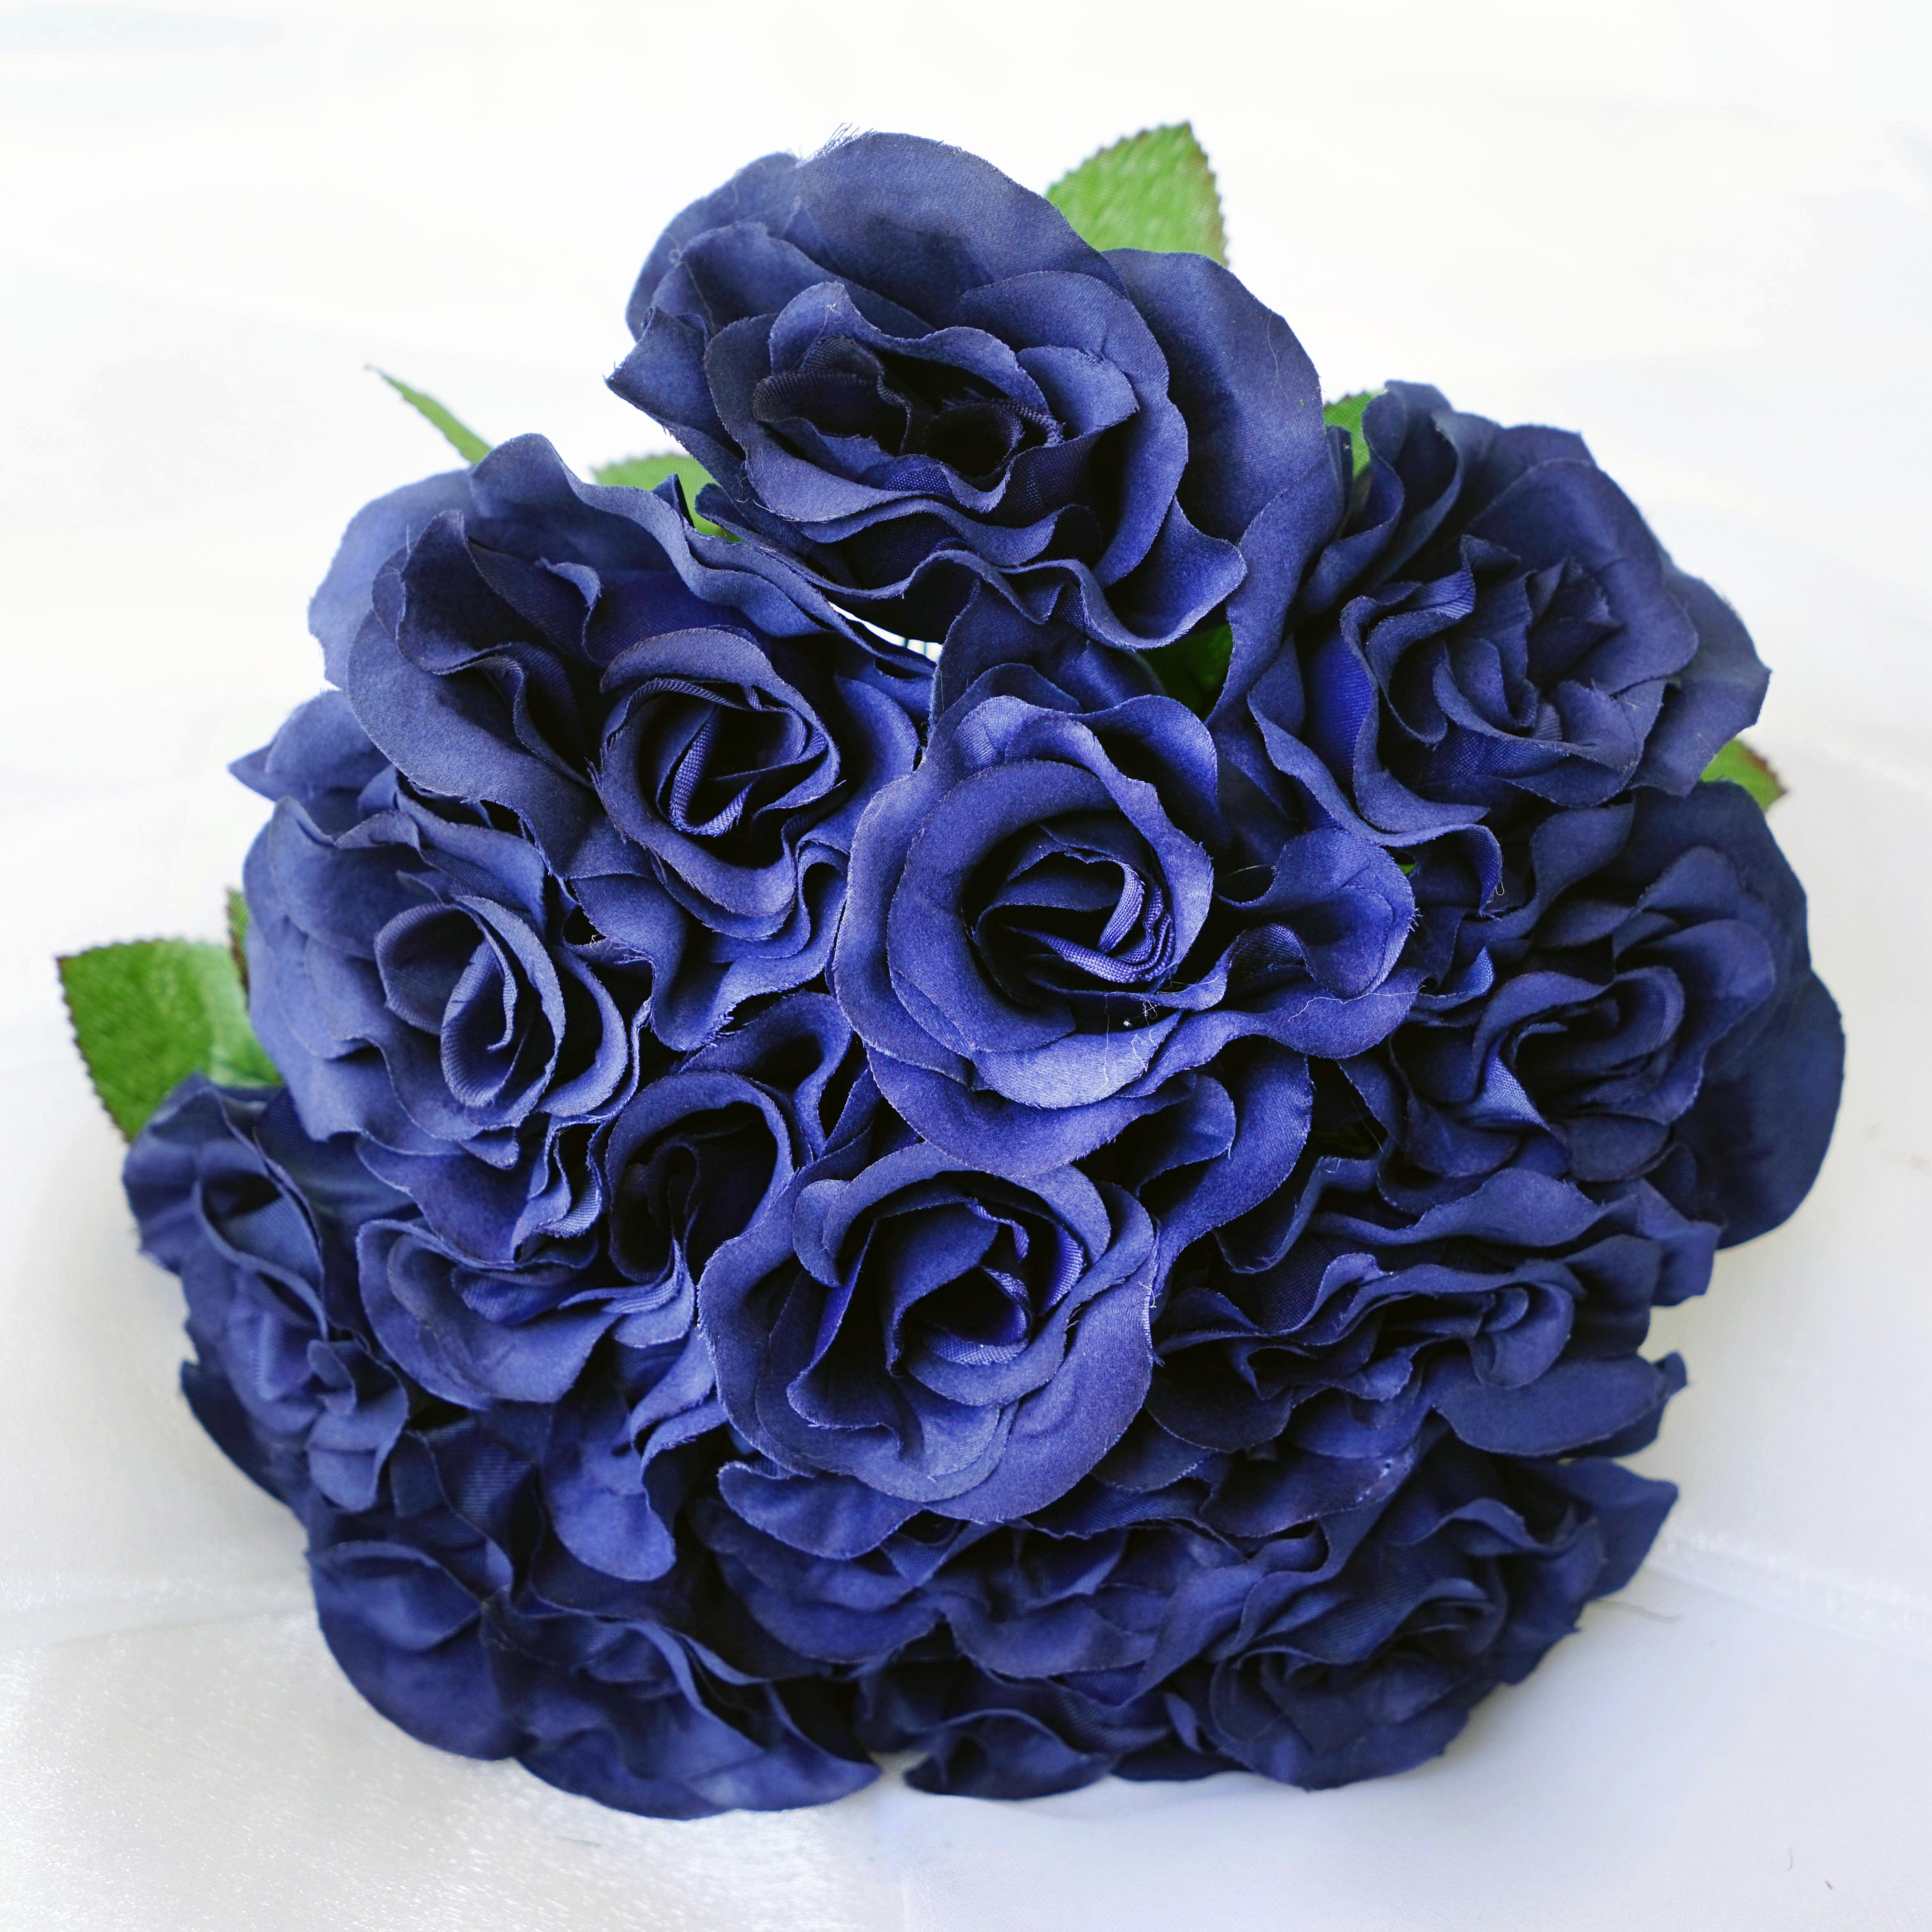 Balsacircle 4 Velvet Roses Bouquets Bridal Flowers Diy Home